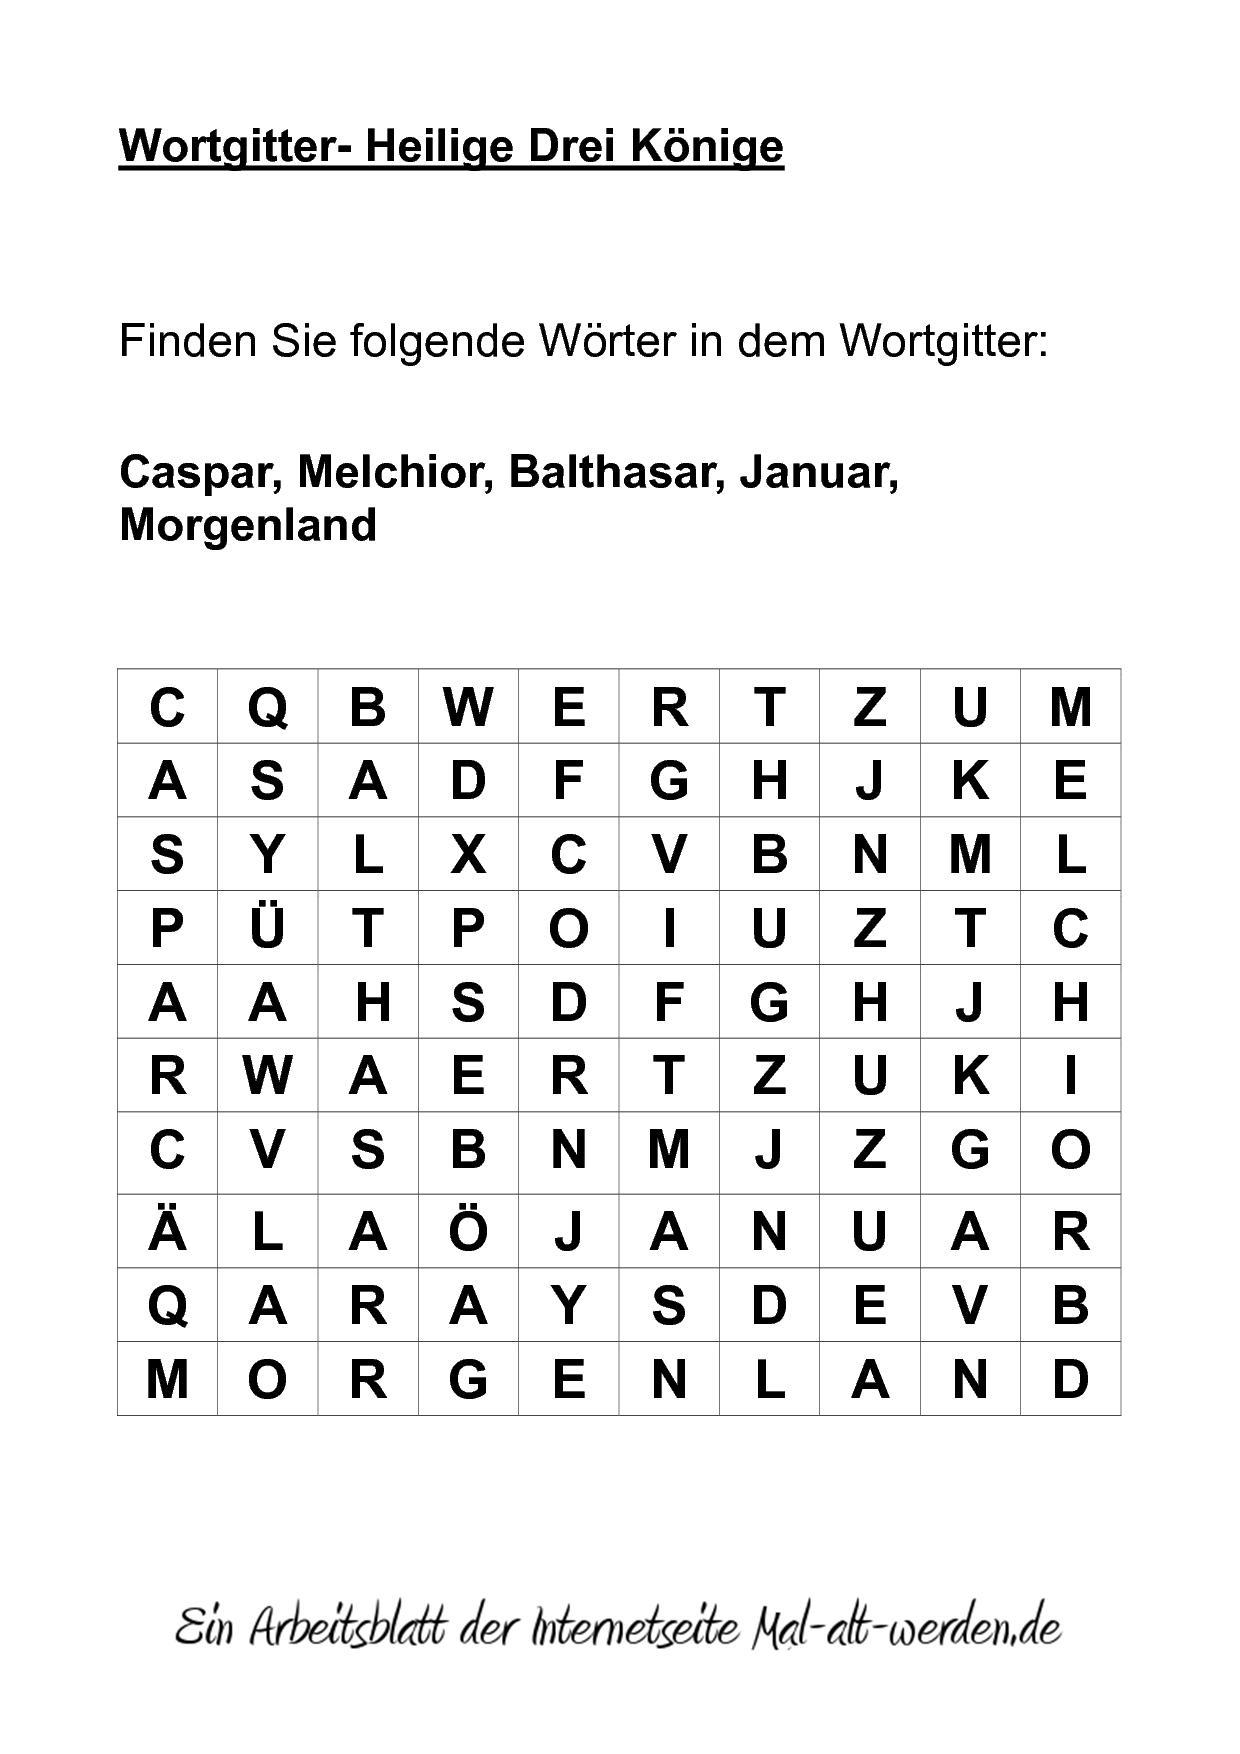 Arbeitsblatt Vorschule Mathe 4 Klasse Geometrie Spiegeln Kostenlose ...